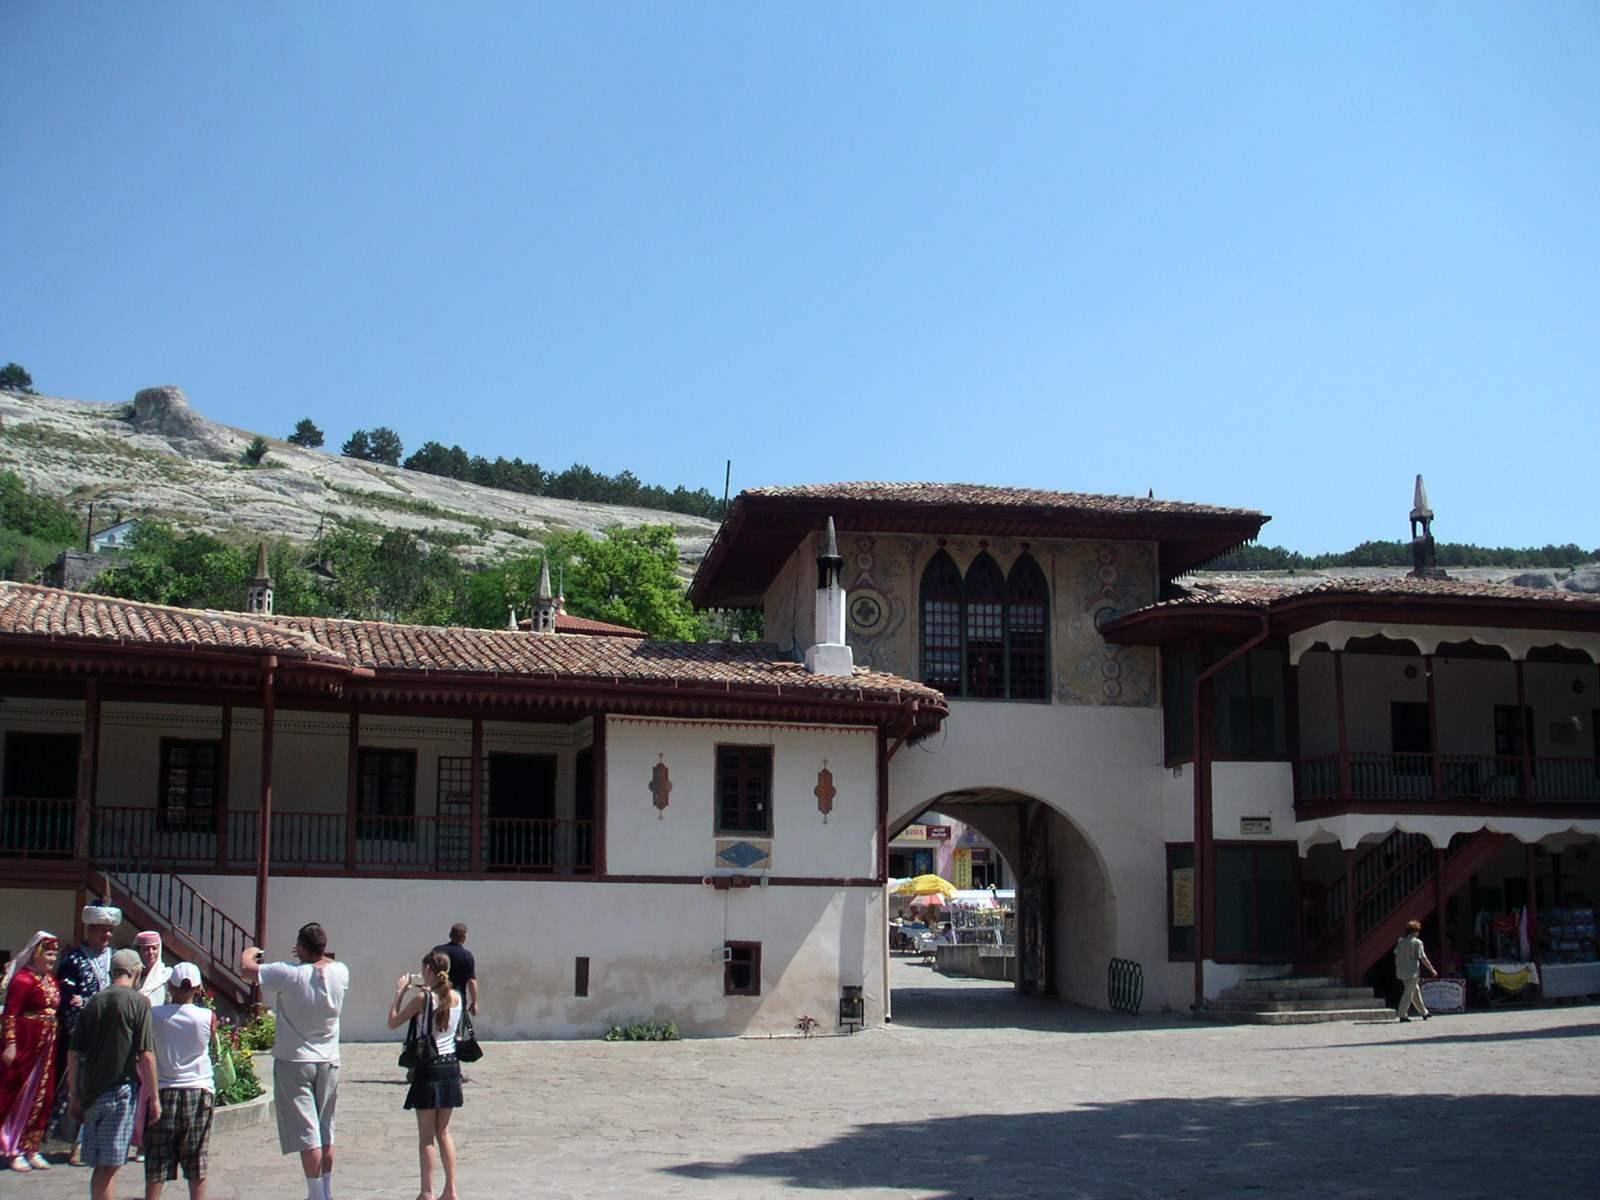 Bakhchisarai: a selection of sites